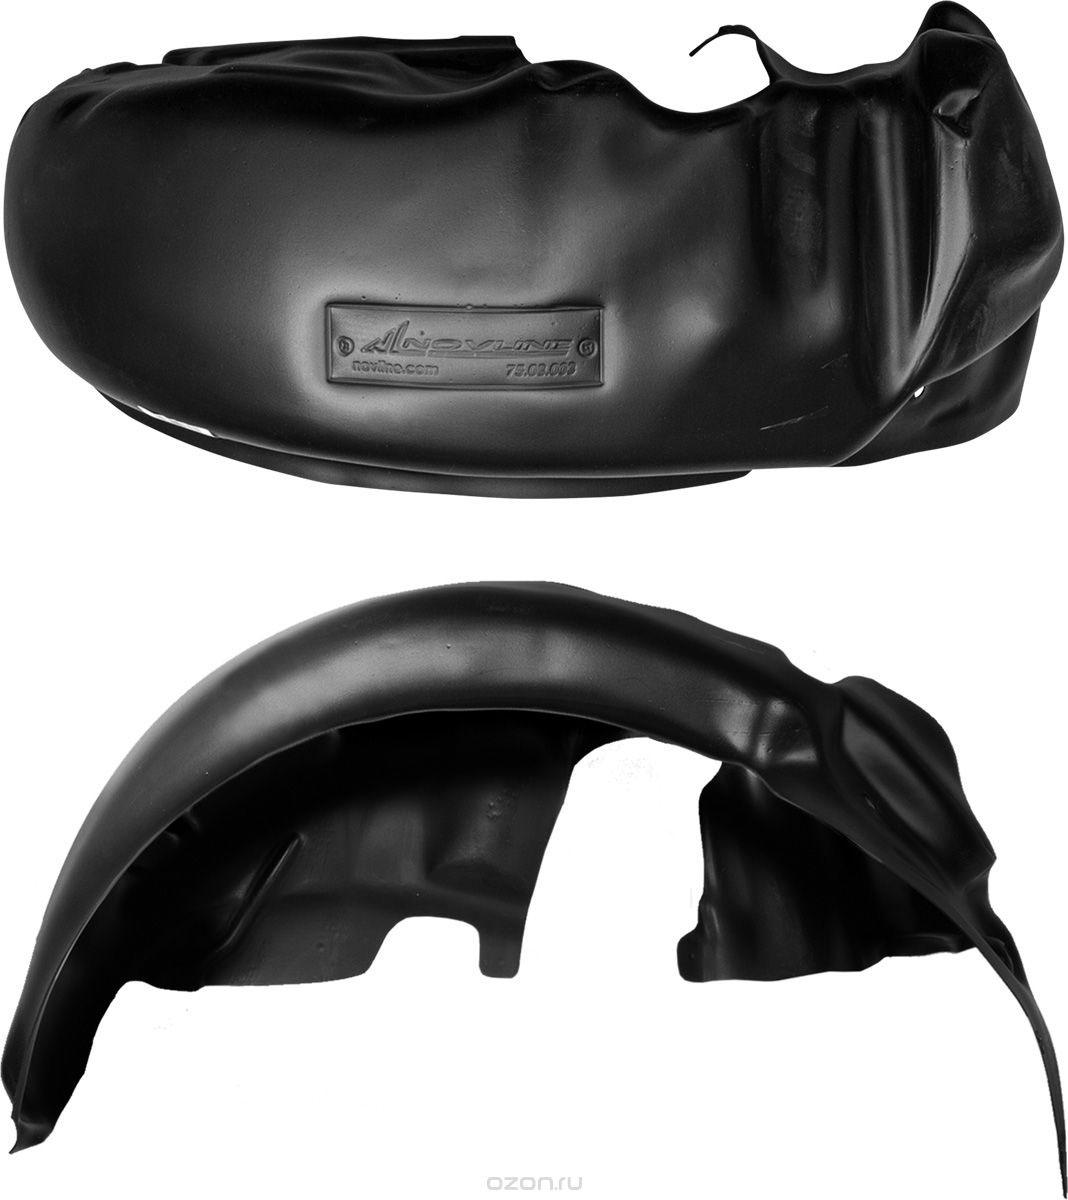 Подкрылок Novline-Autofamily, для Faw Besturn B50, 2012->, задний правый подкрылок novline autofamily для faw besturn b50 2012 задний правый